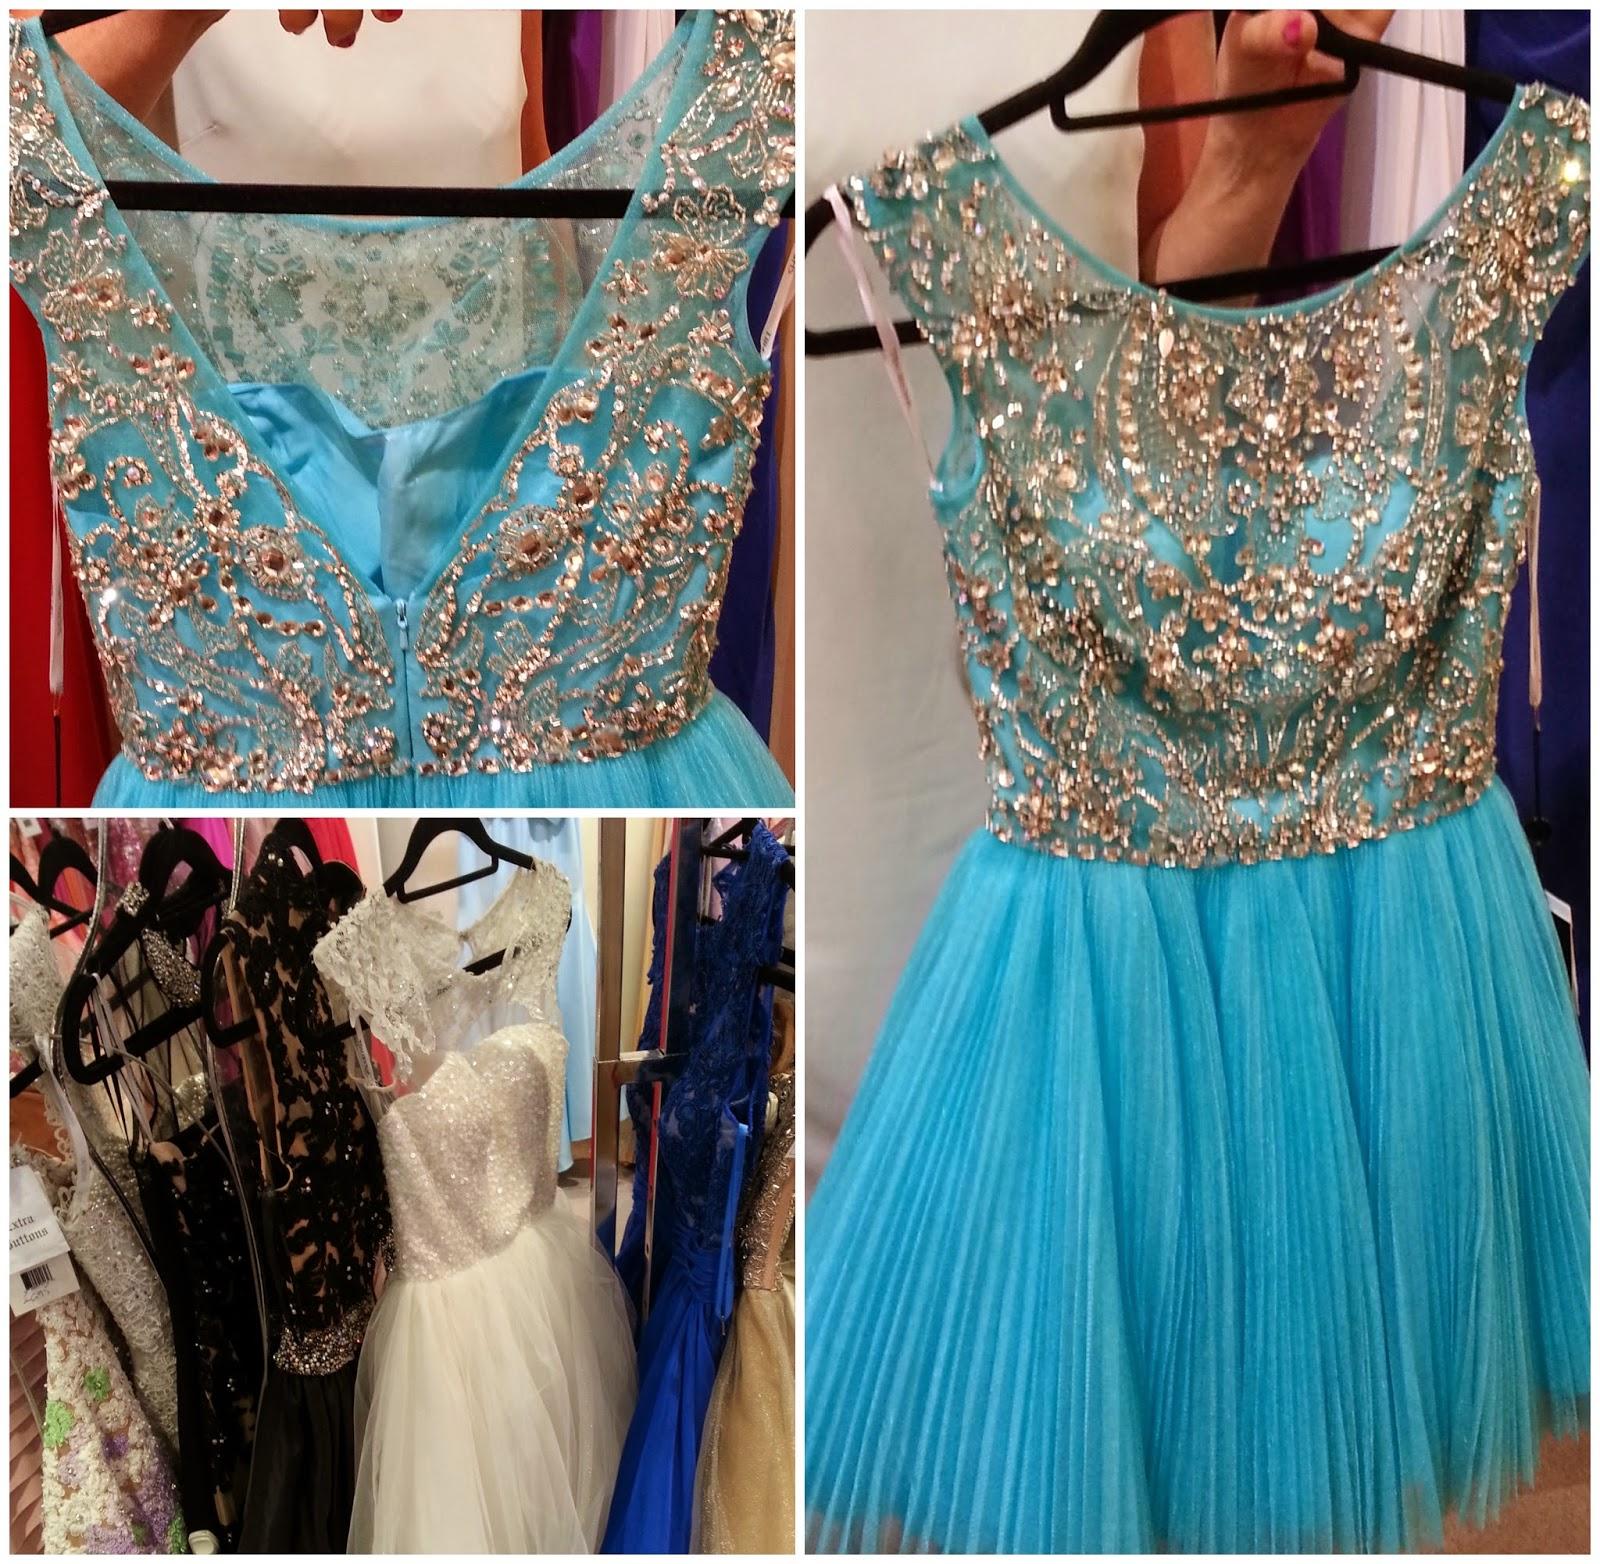 Manchester Prom Dresses – fashion dresses